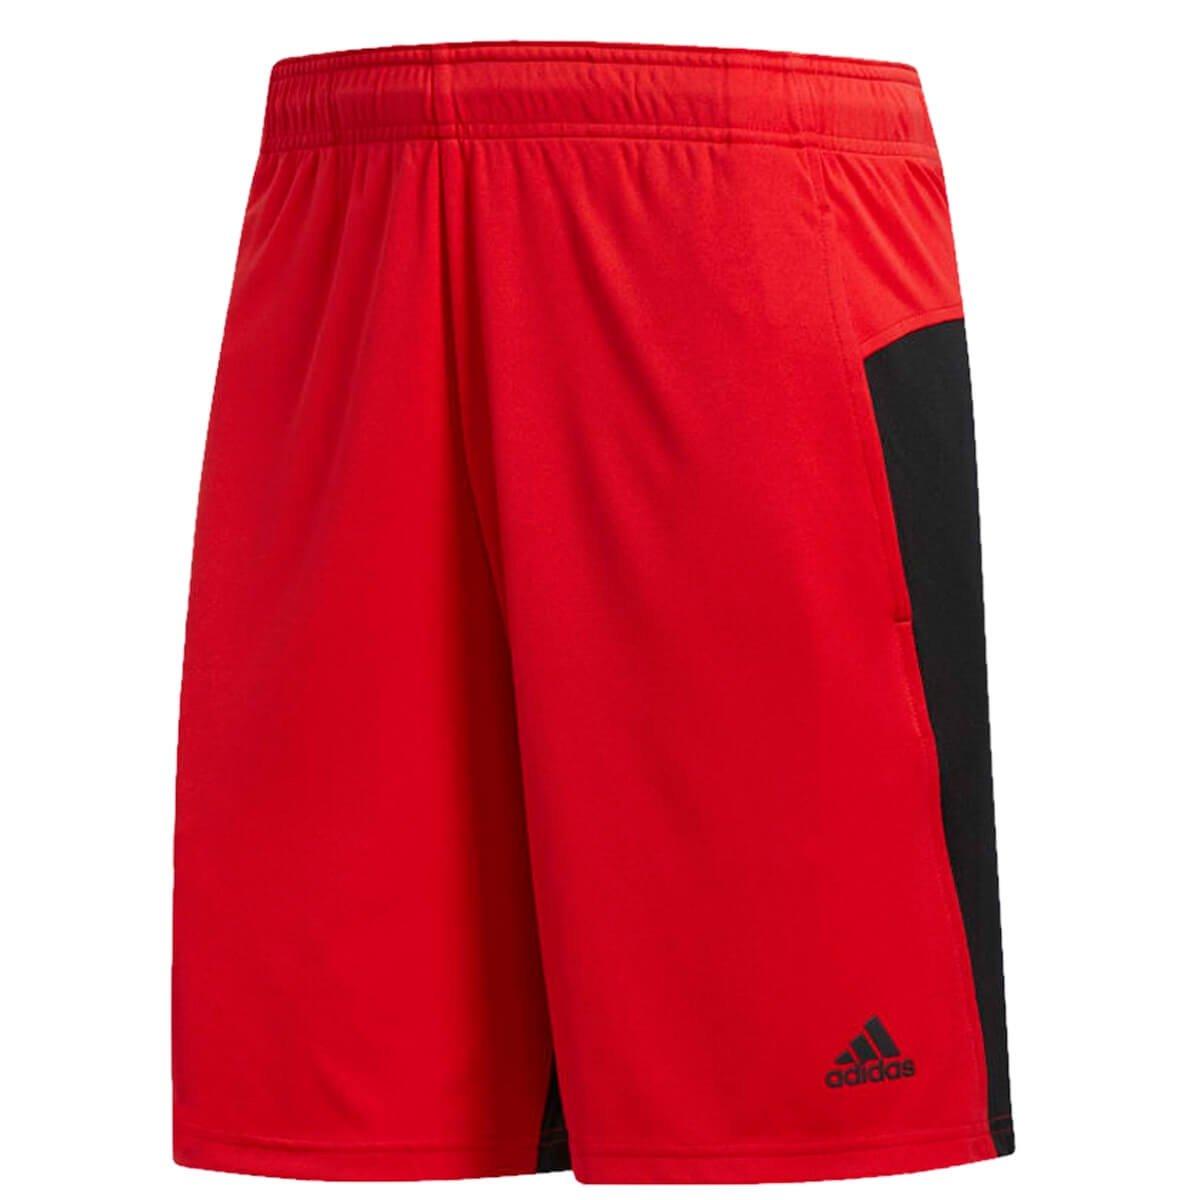 821f0ead1c Bizz Store - Bermuda Masculina Adidas Plain